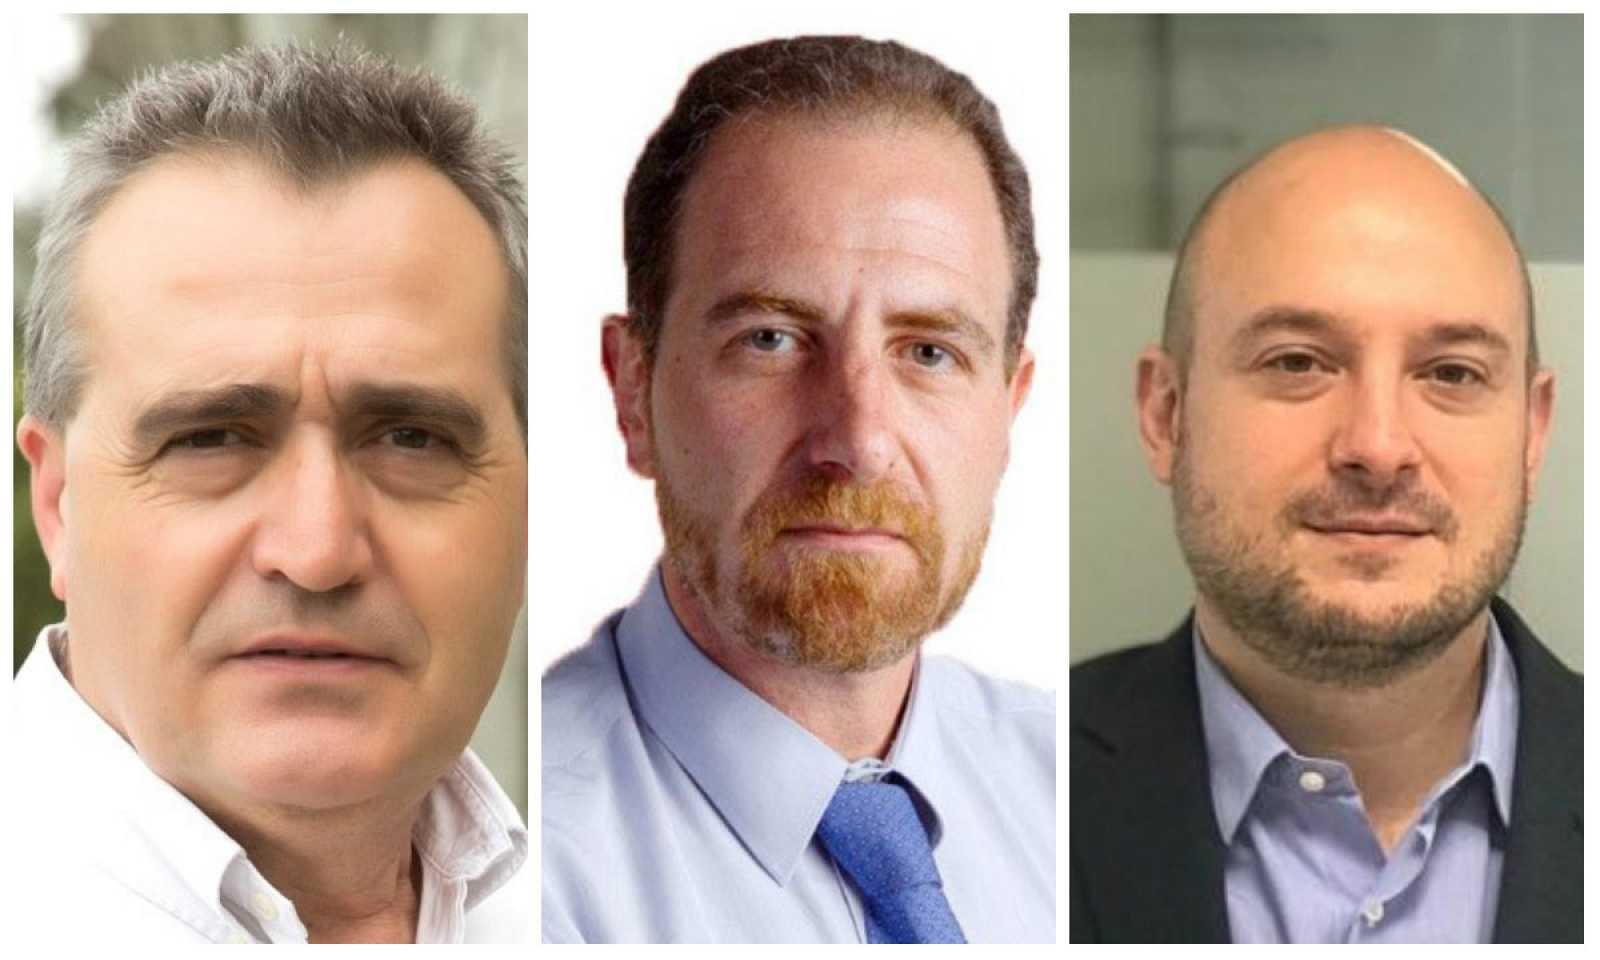 David Valcarce, Enric Hernández y Víctor Sánchez